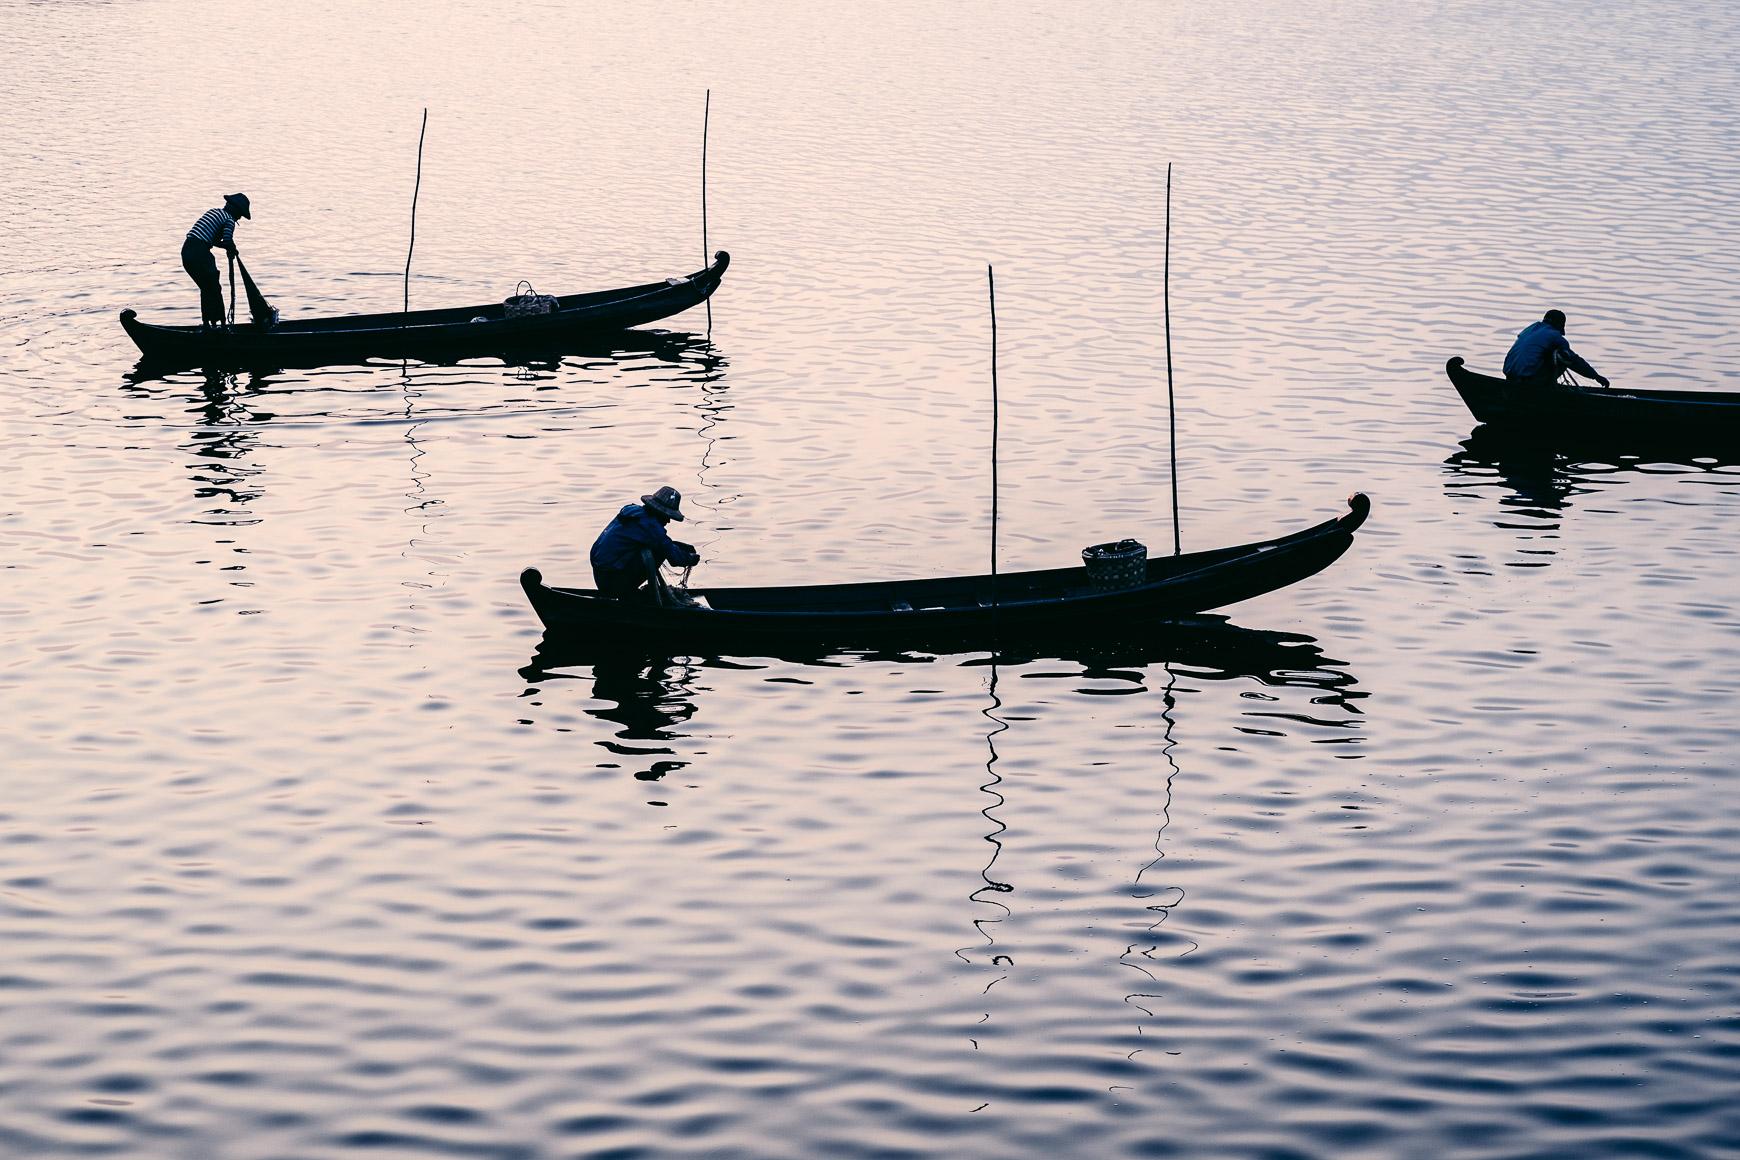 3_Fisherman_Myanmar.jpg